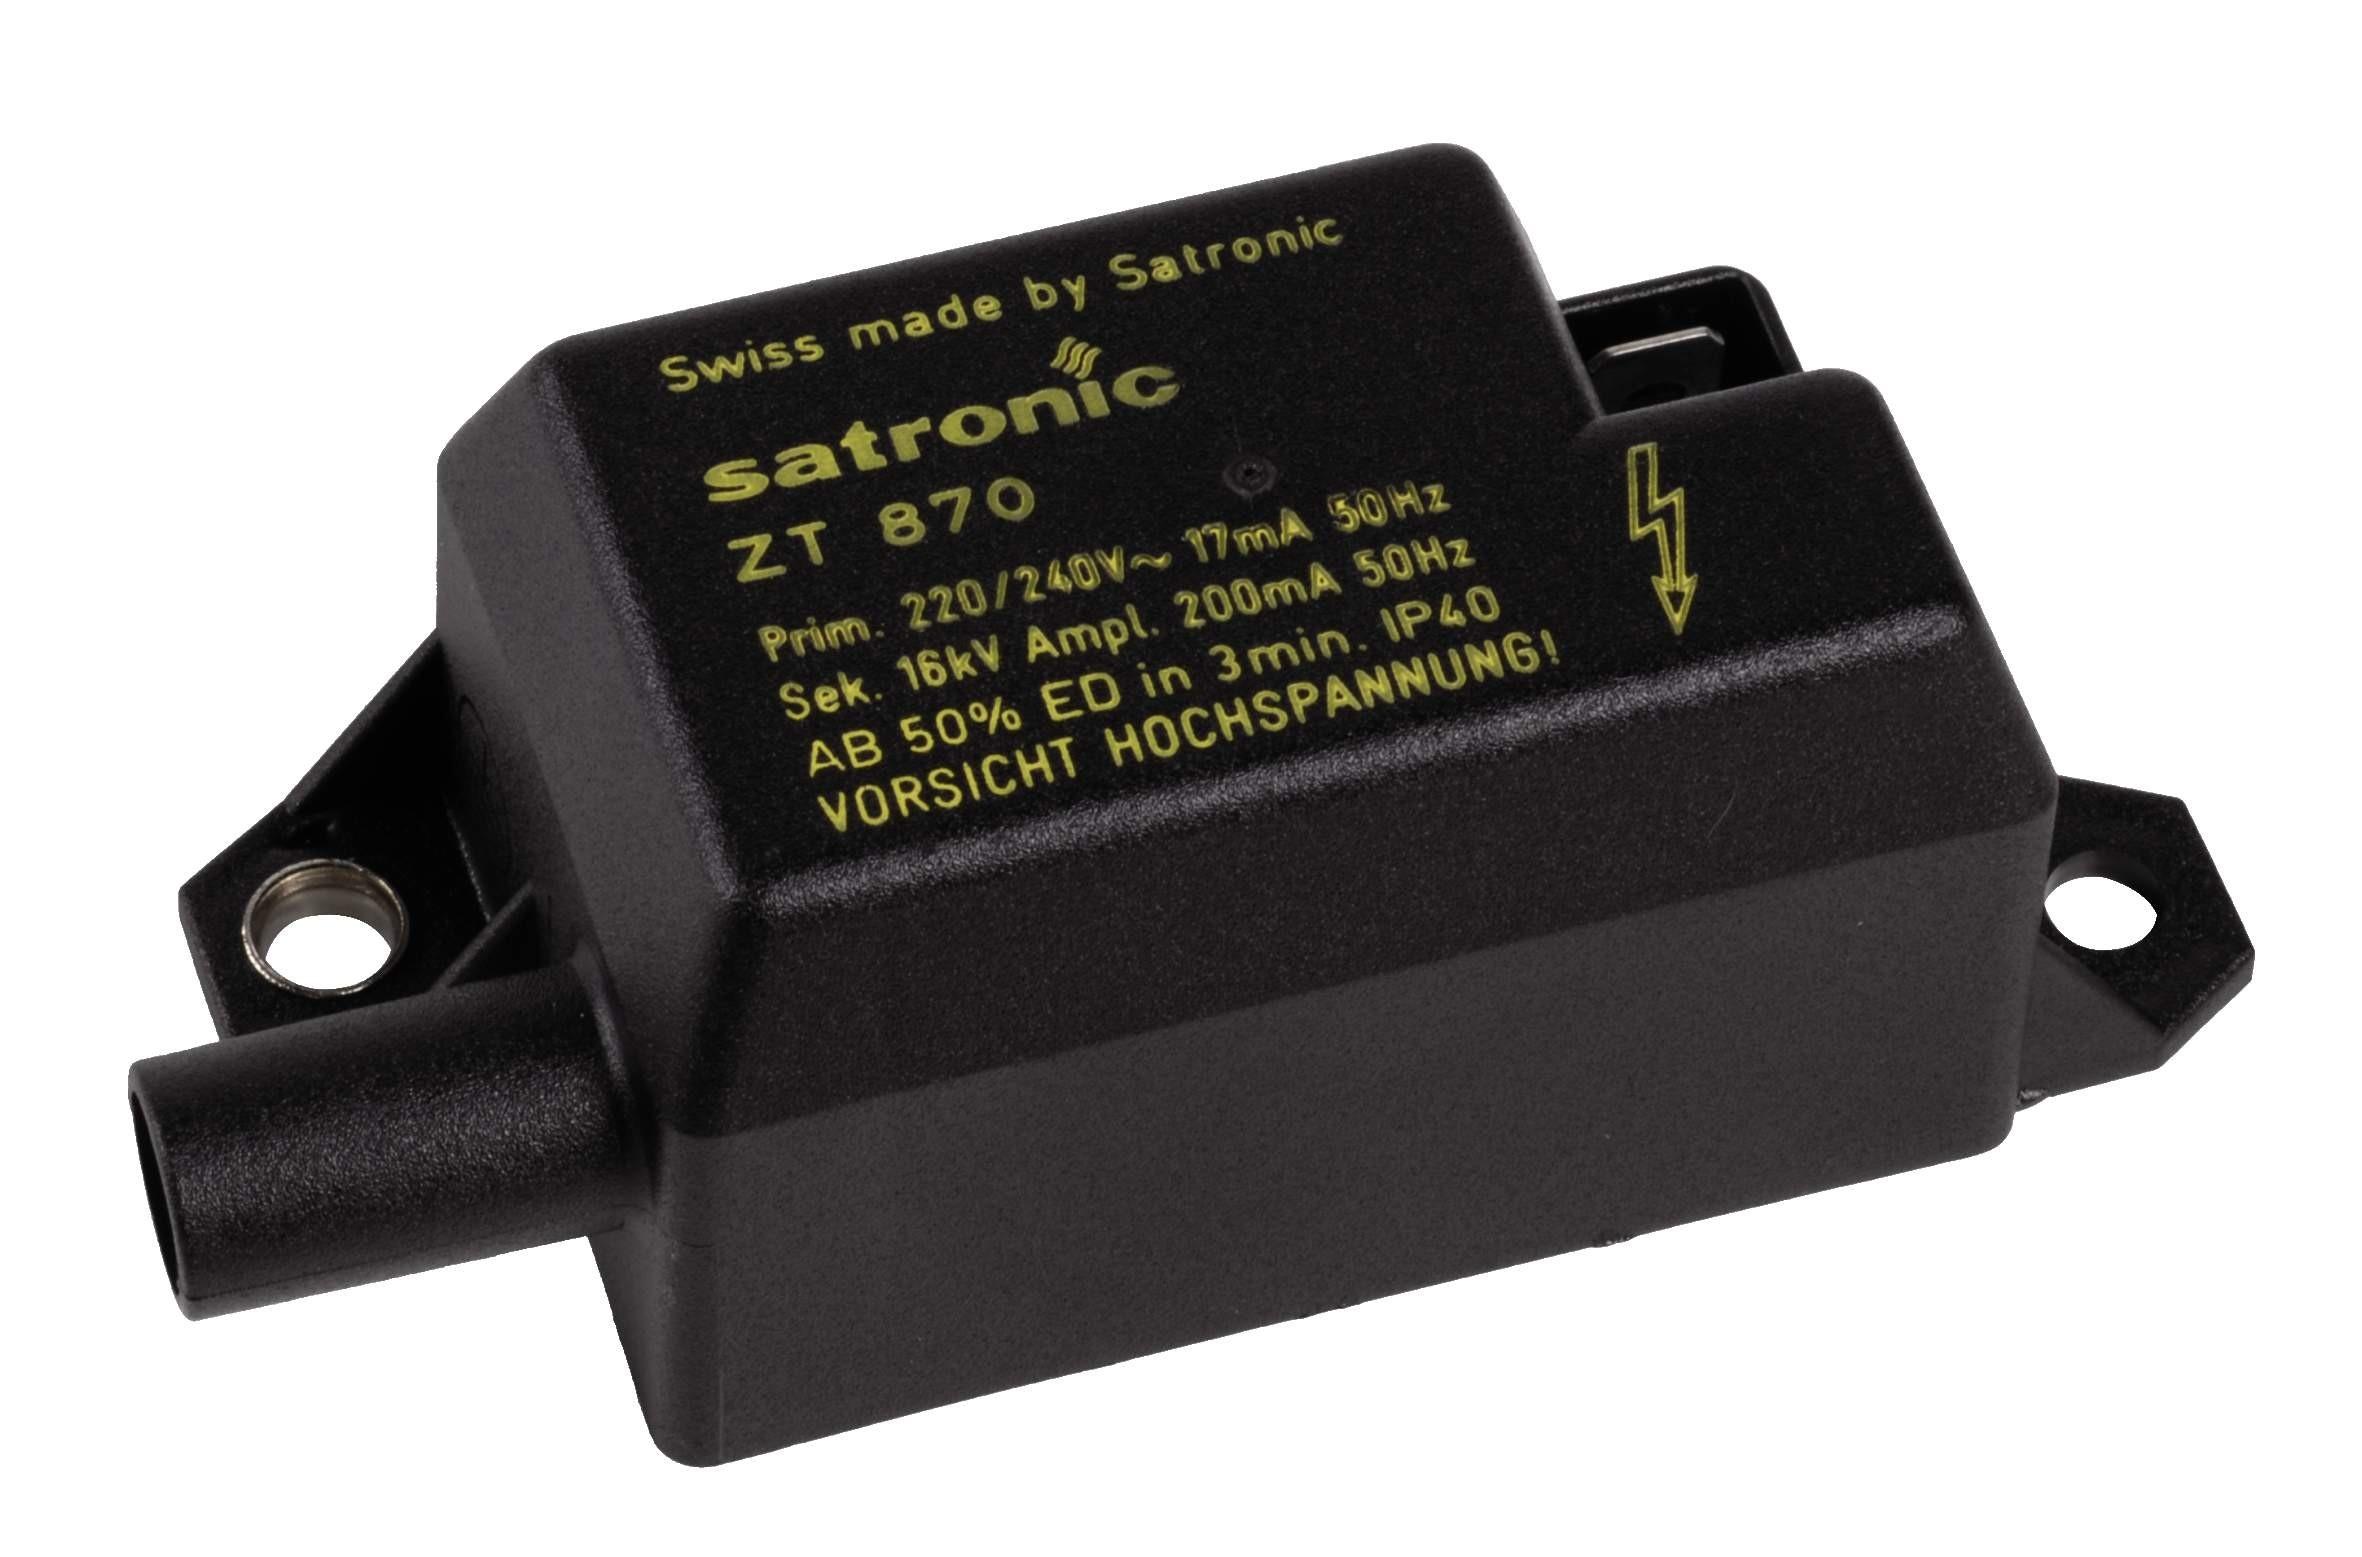 HONEYWELL SATRONIC ZT870 TRANSFORMER 230V